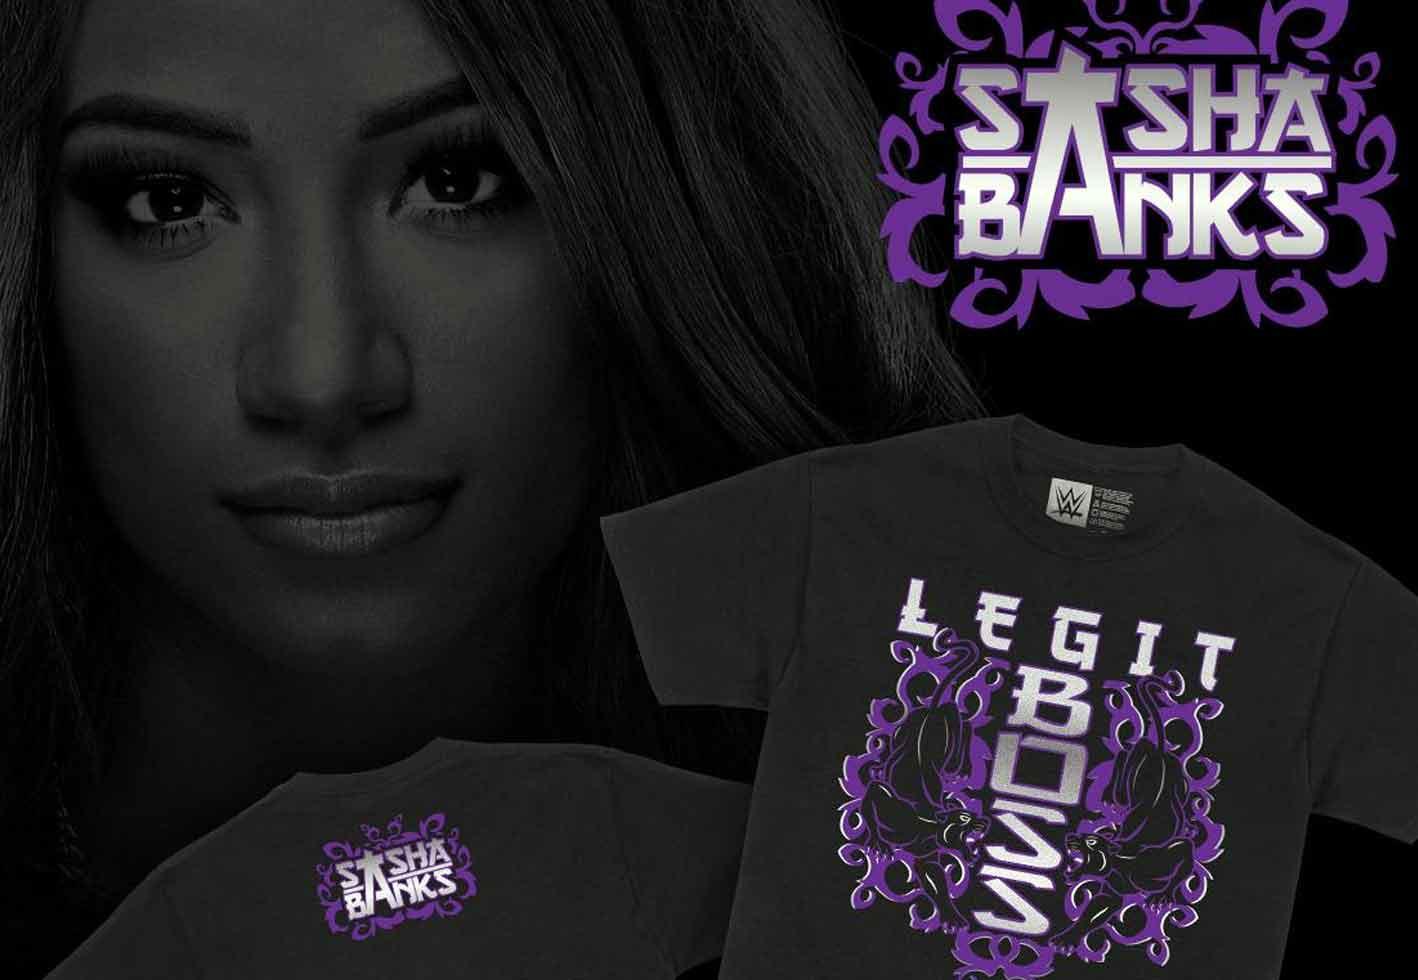 Camiseta de Sasha Banks